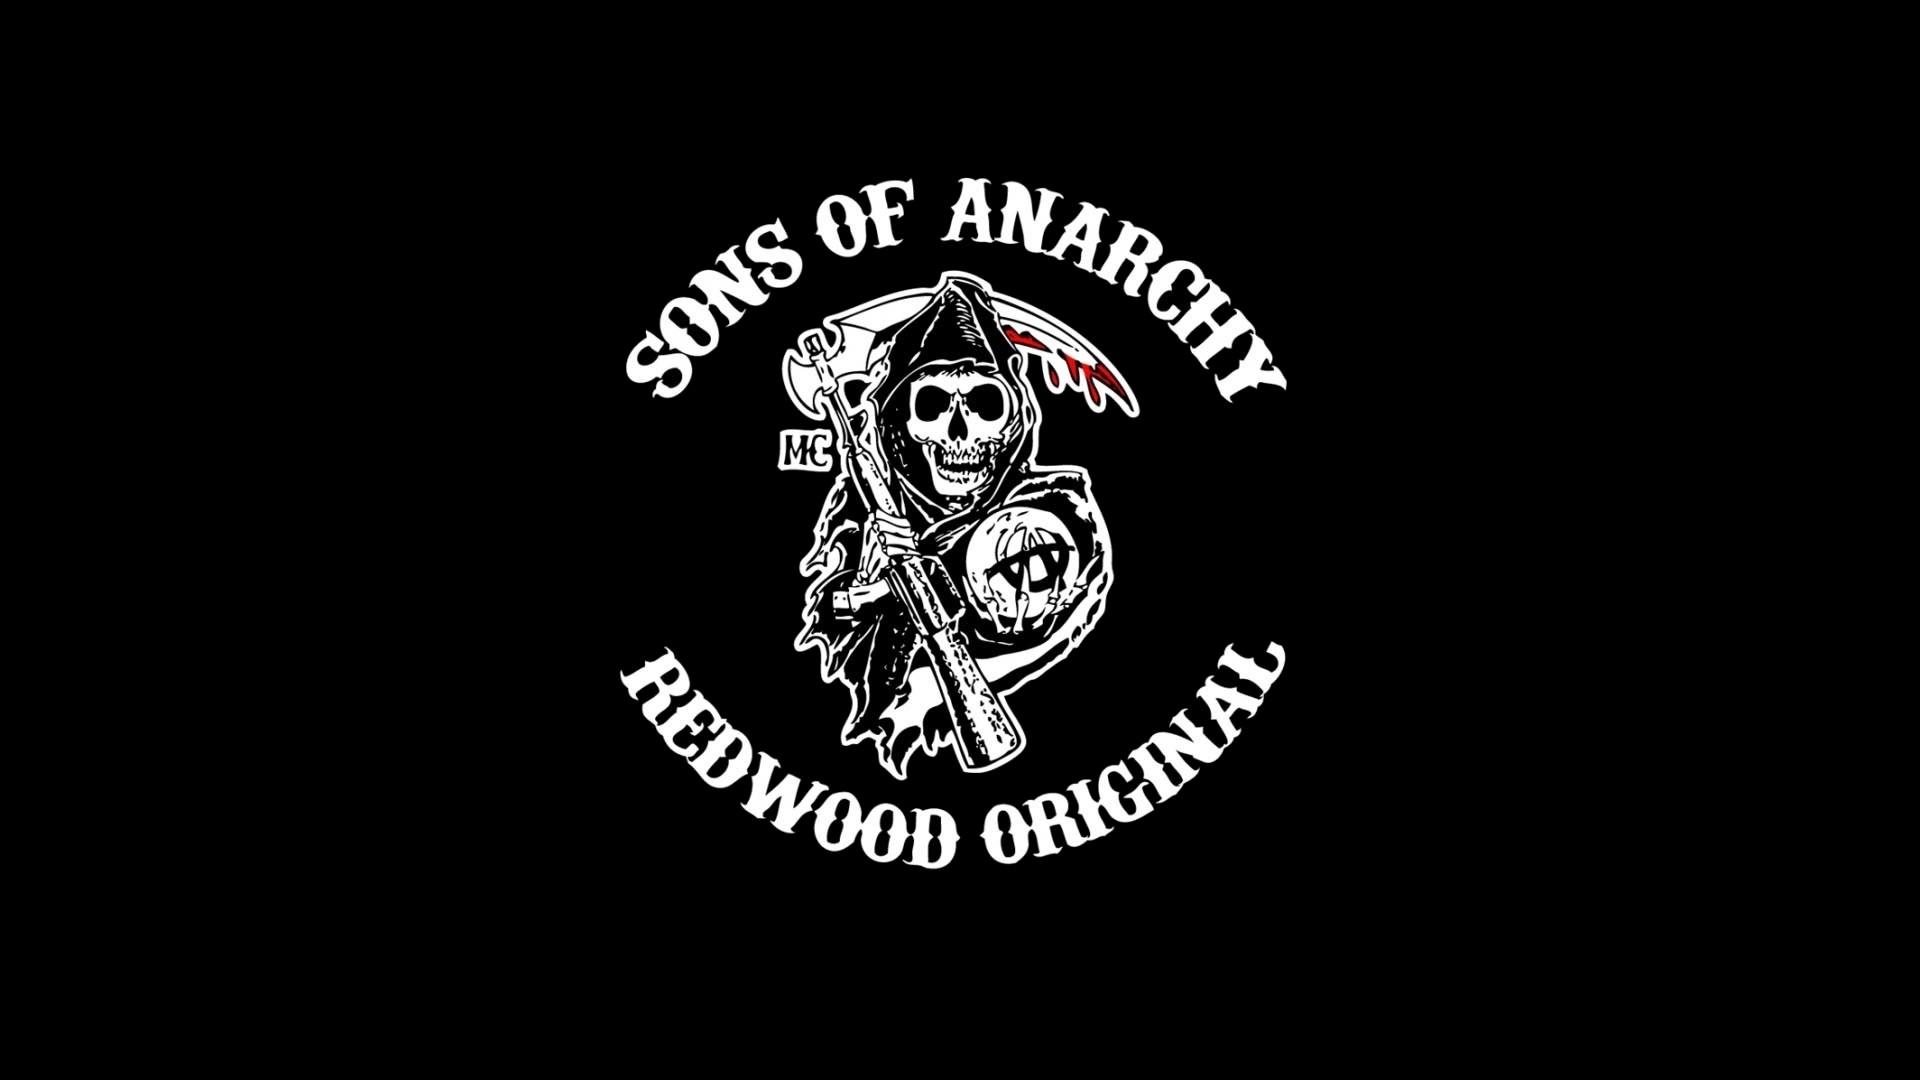 Sons Of AnarchyBehanceIllustrationMovieSeasonsJax TellerOutlaws Motorcycle  ClubMotorcycle ClubsChopper